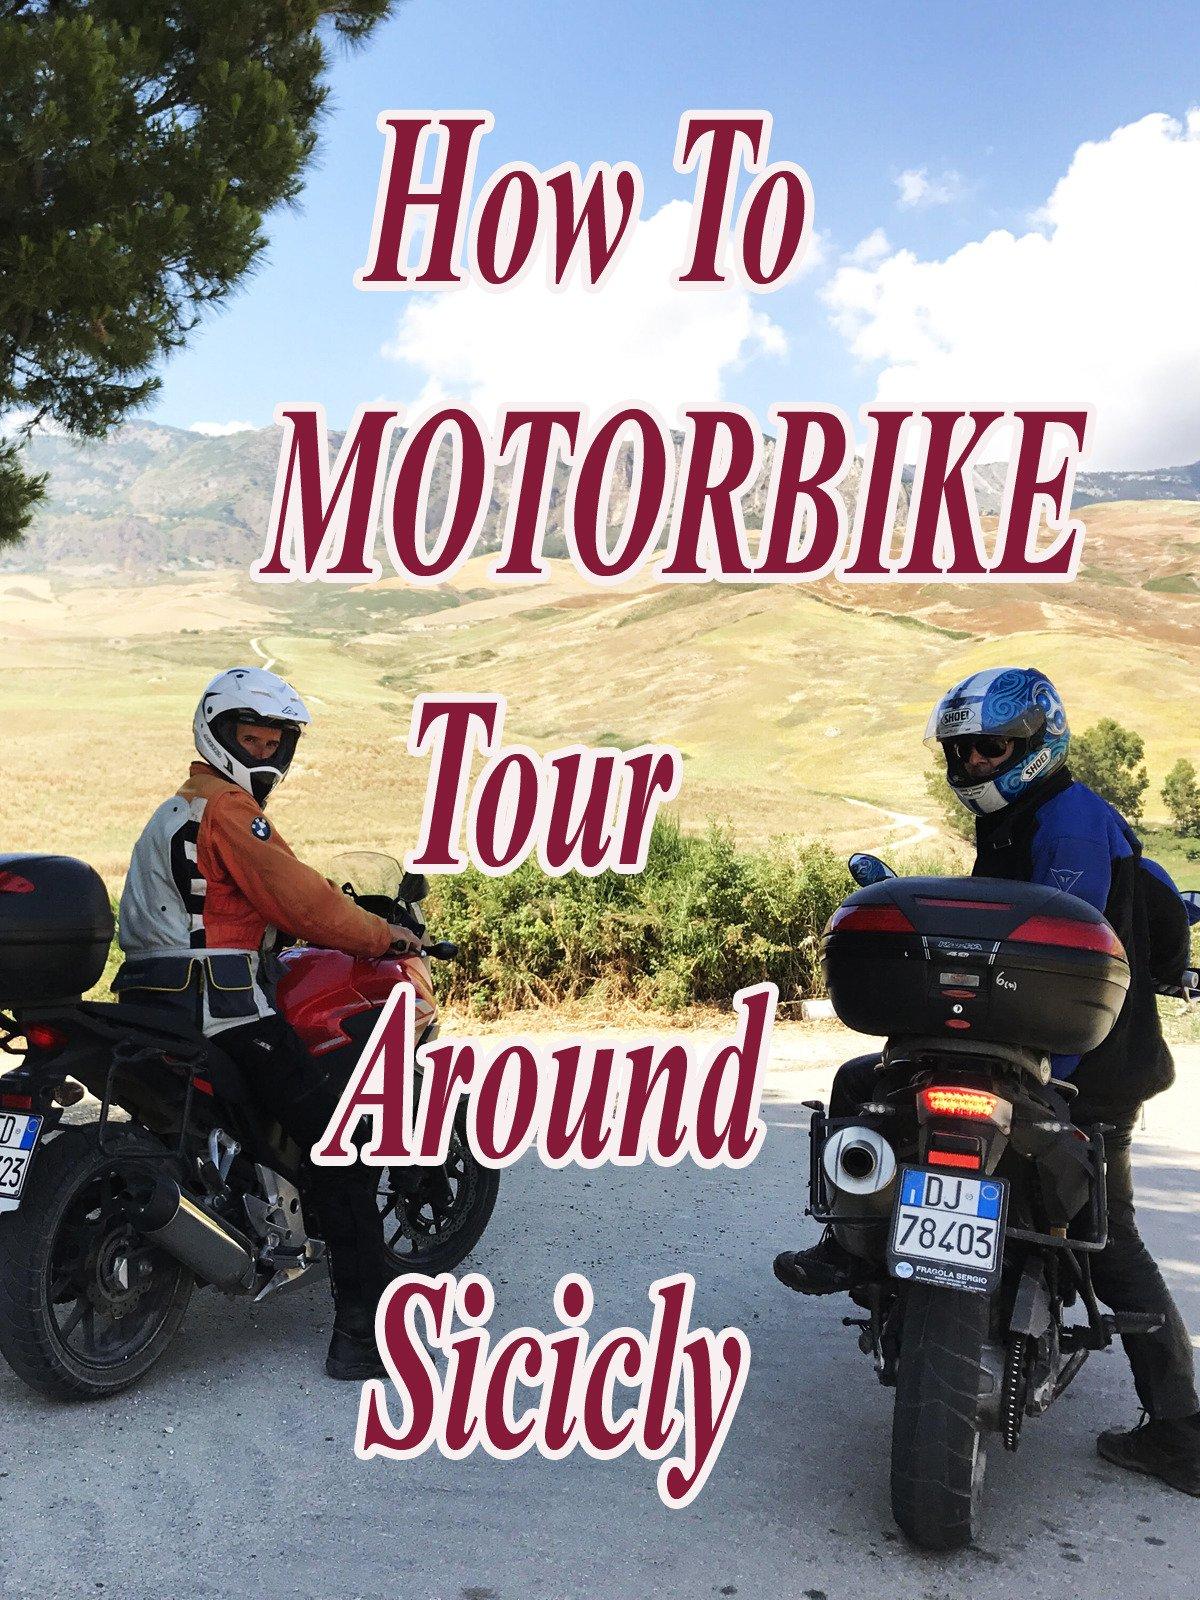 How To Motorbike Tour Around Sicily on Amazon Prime Video UK